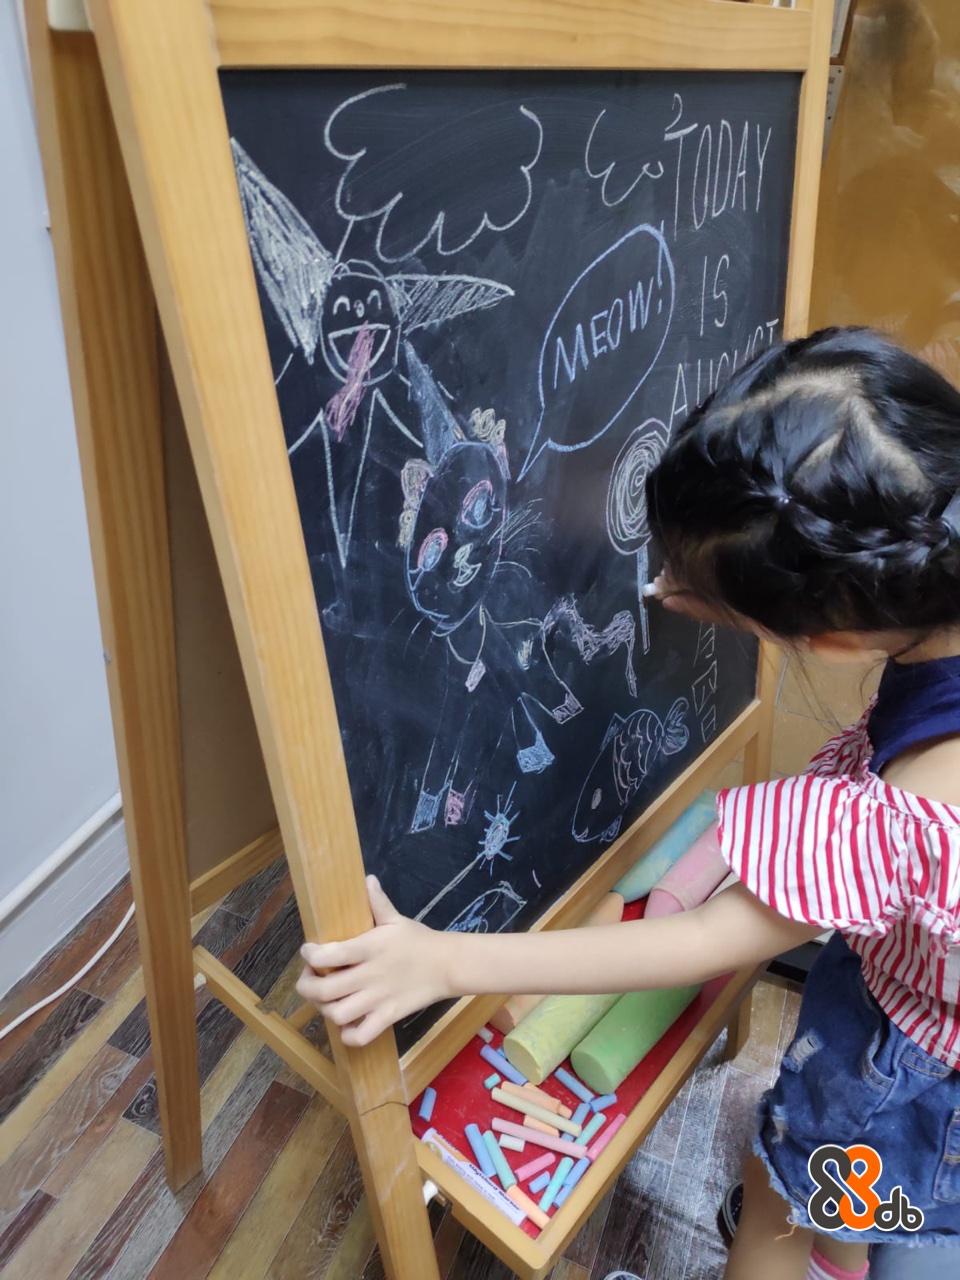 MEDWA  Blackboard,Easel,Office supplies,Chalk,Visual arts